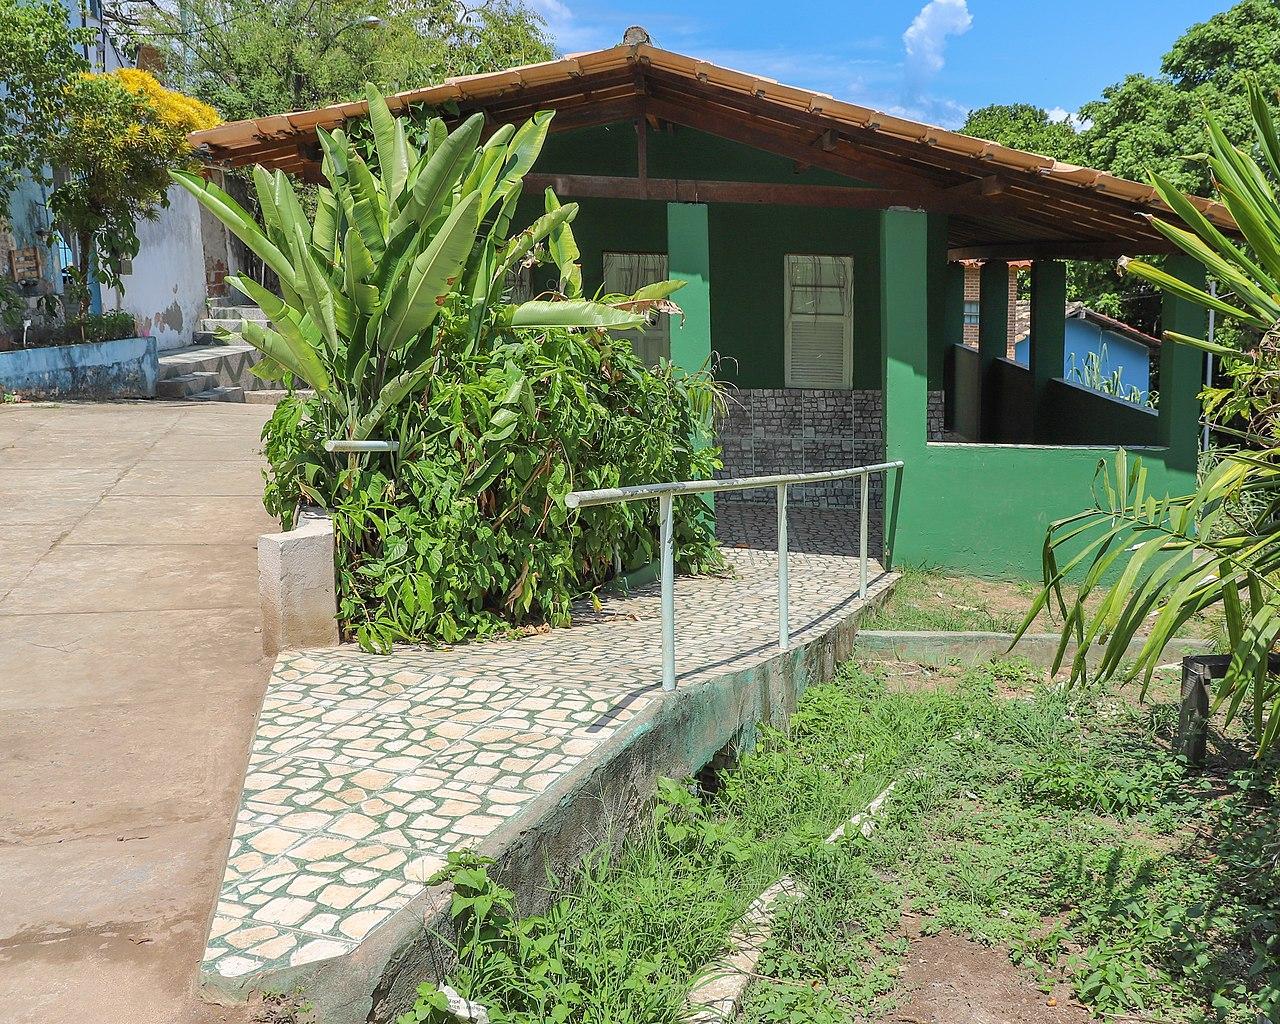 Archivoilê Axé Opô Afonjá Salvador Bahia Casa Ogun 2019